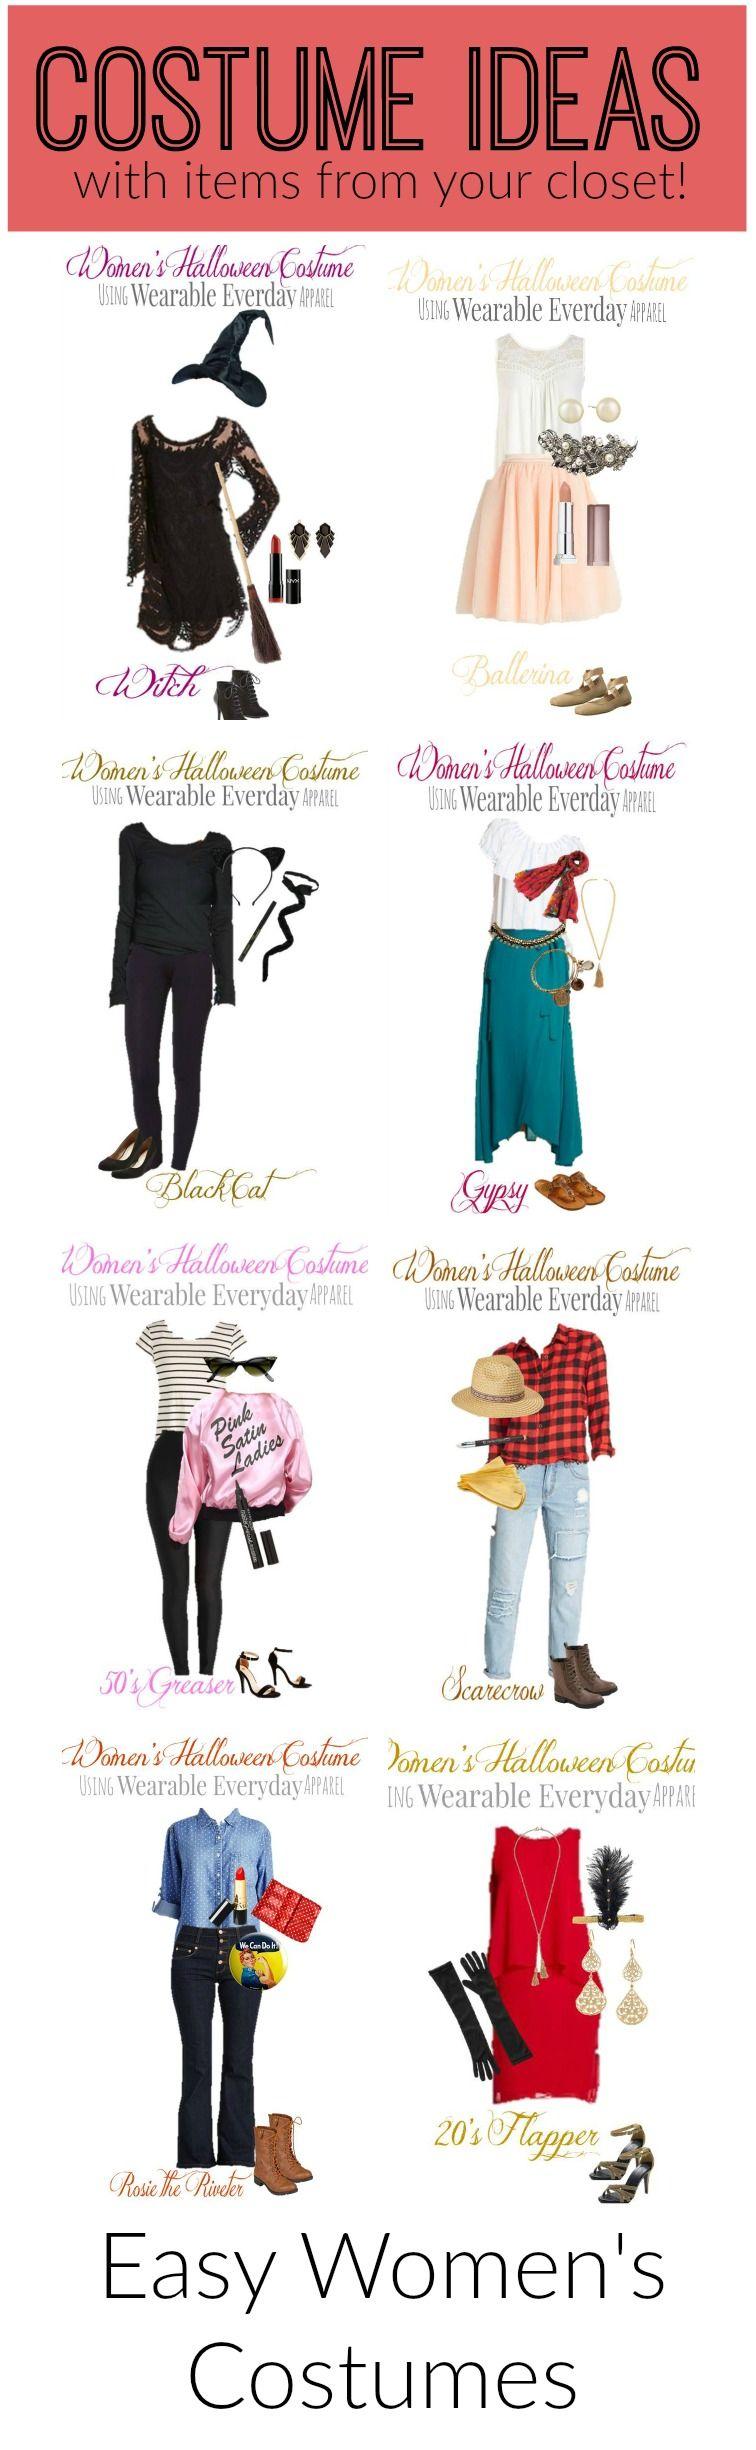 Funny Halloween Costumes Closet 2020 Closet Halloween Ideas in 2020 | Easy halloween costumes for women